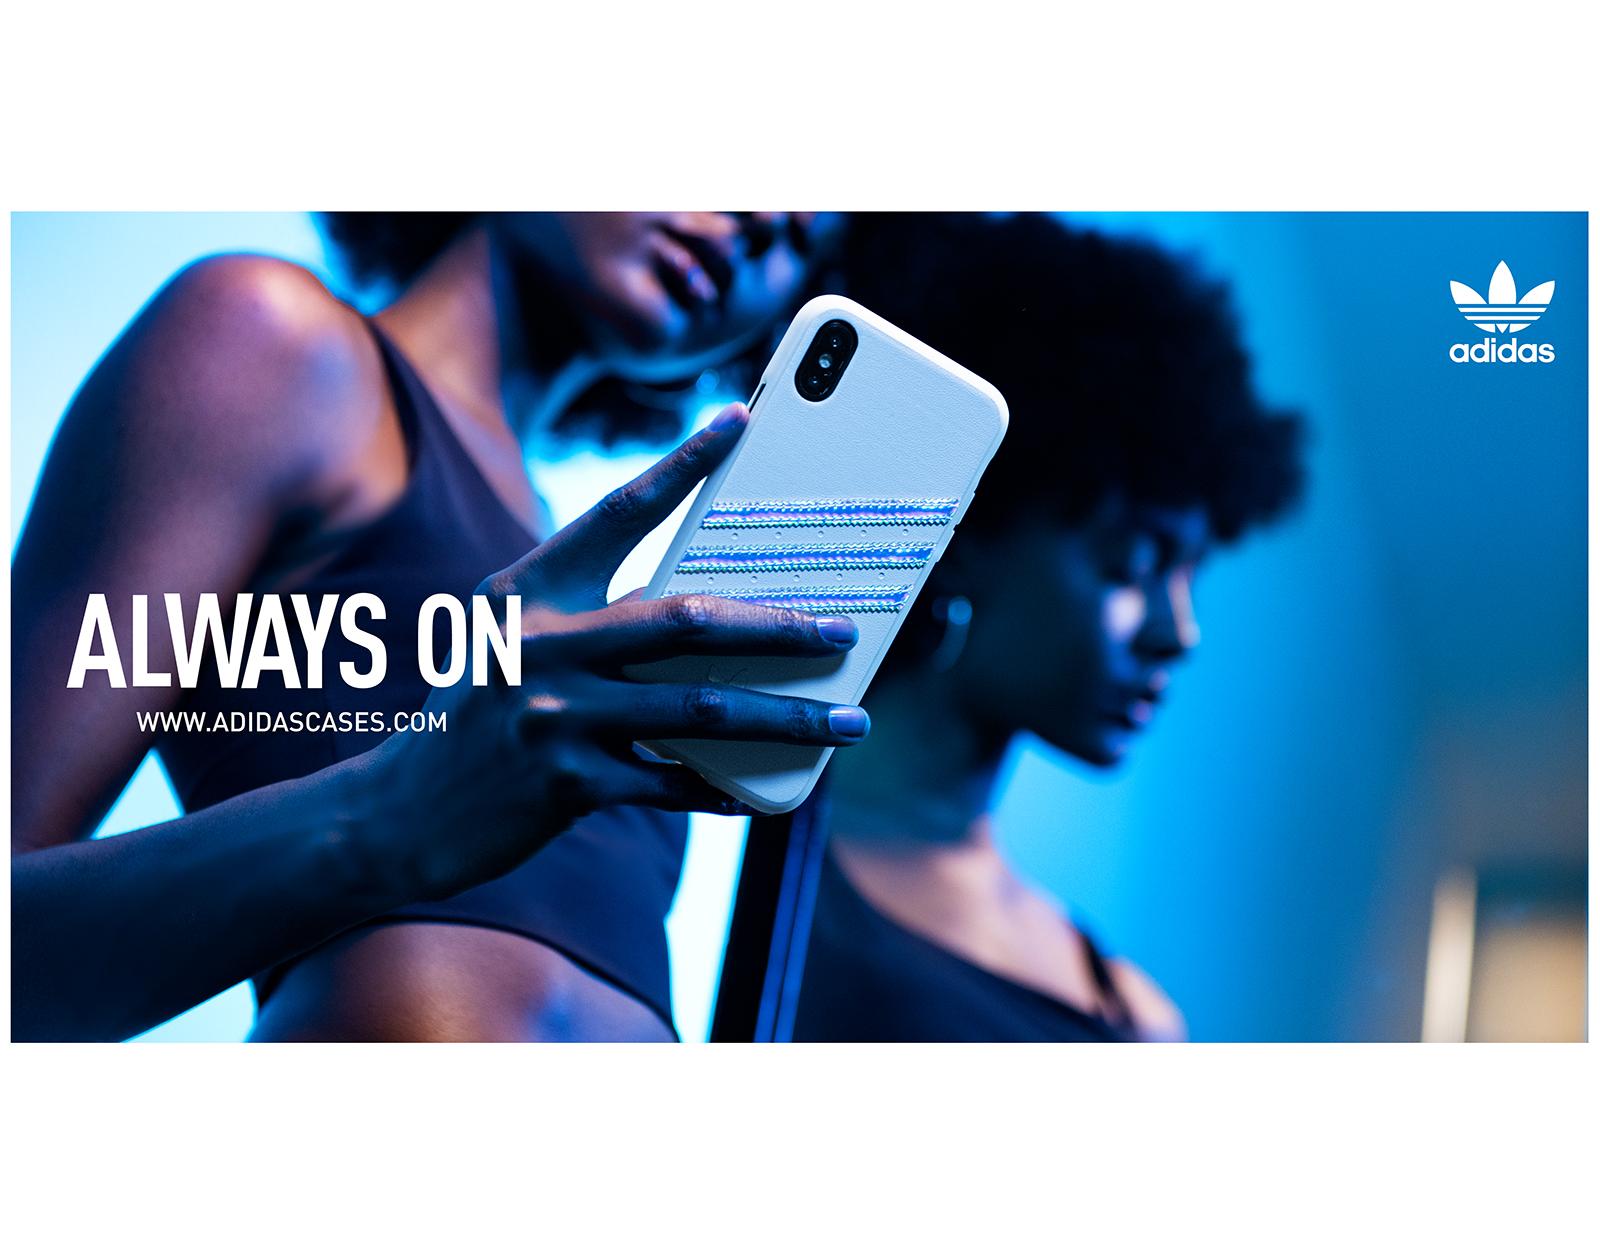 ASS_adidas_Always On 05.jpg